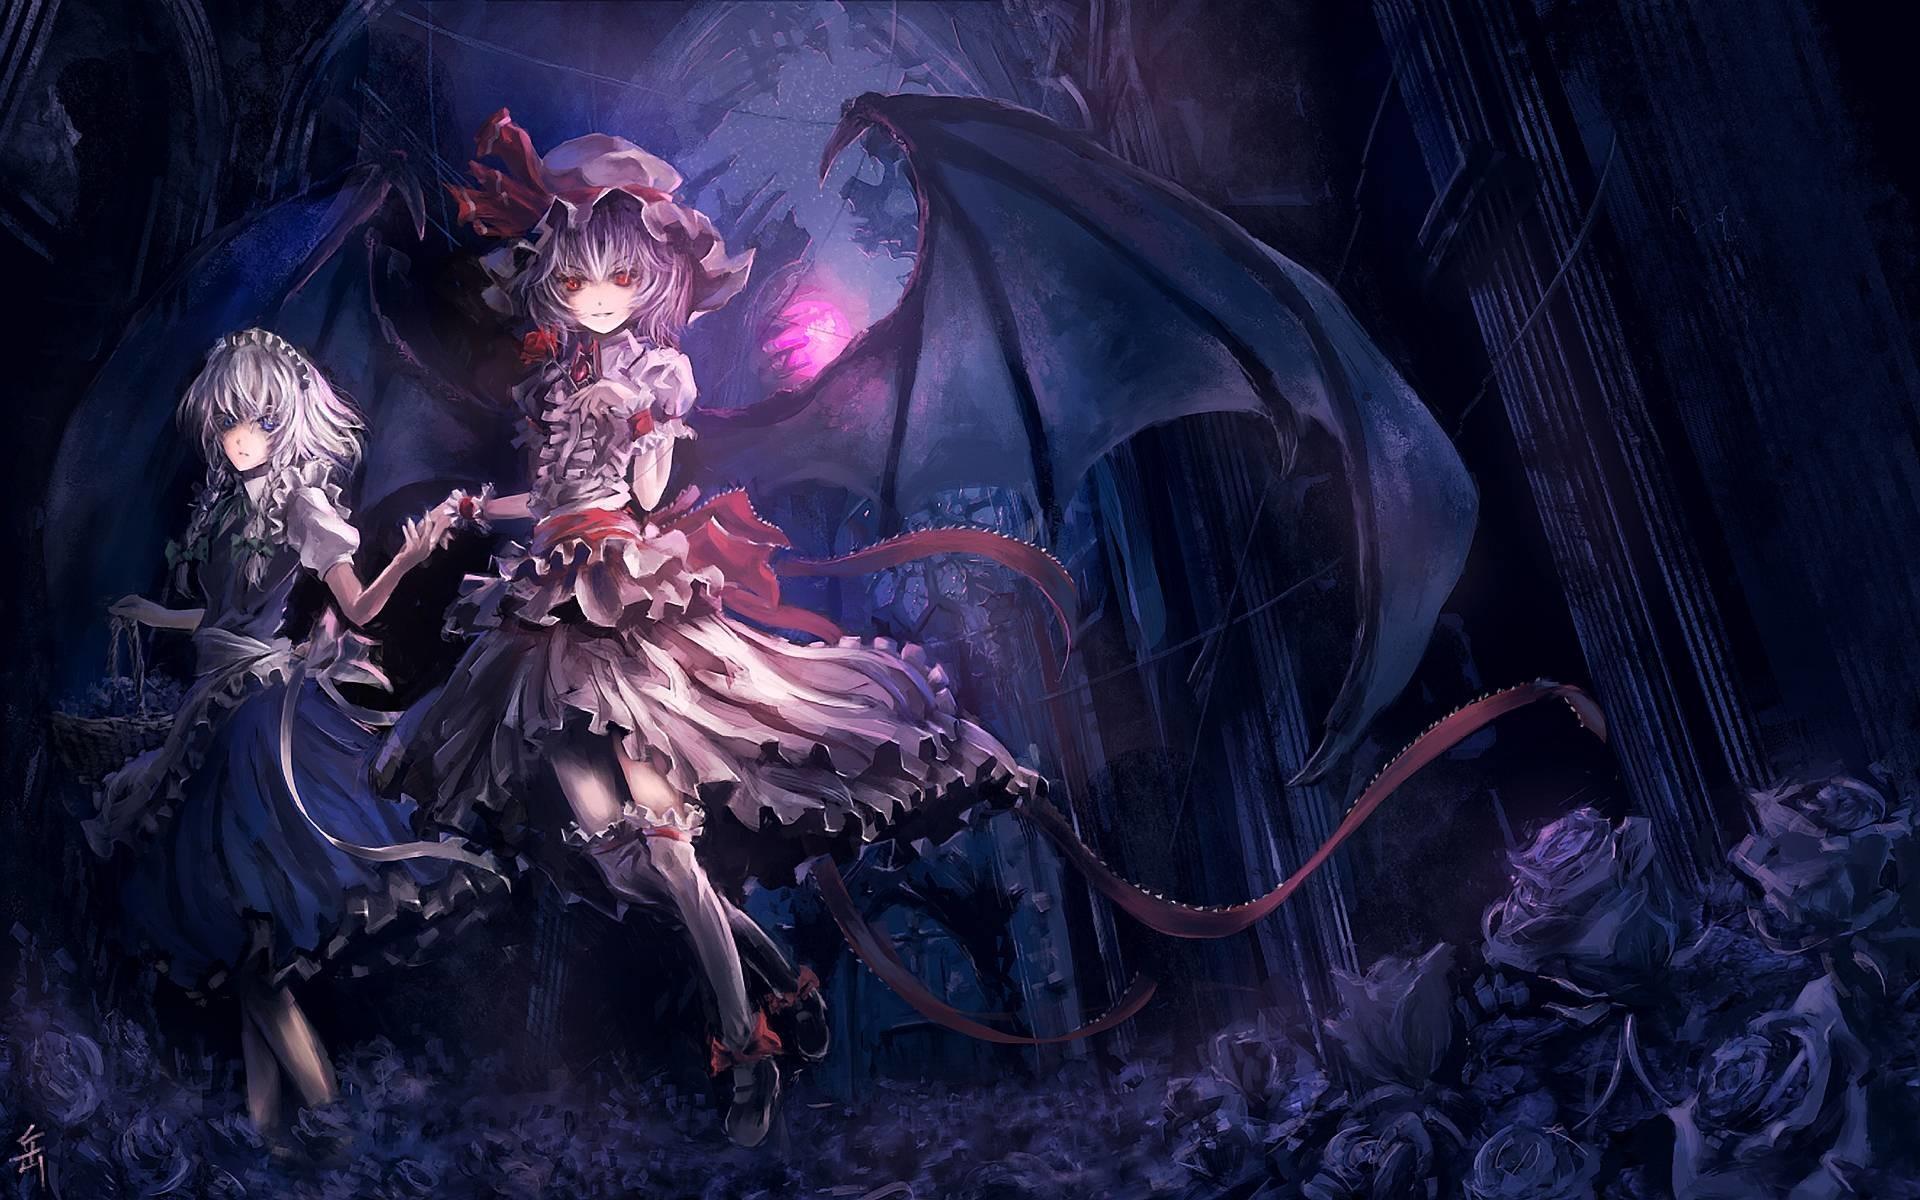 Dark Anime Scenery Wallpaper High Quality